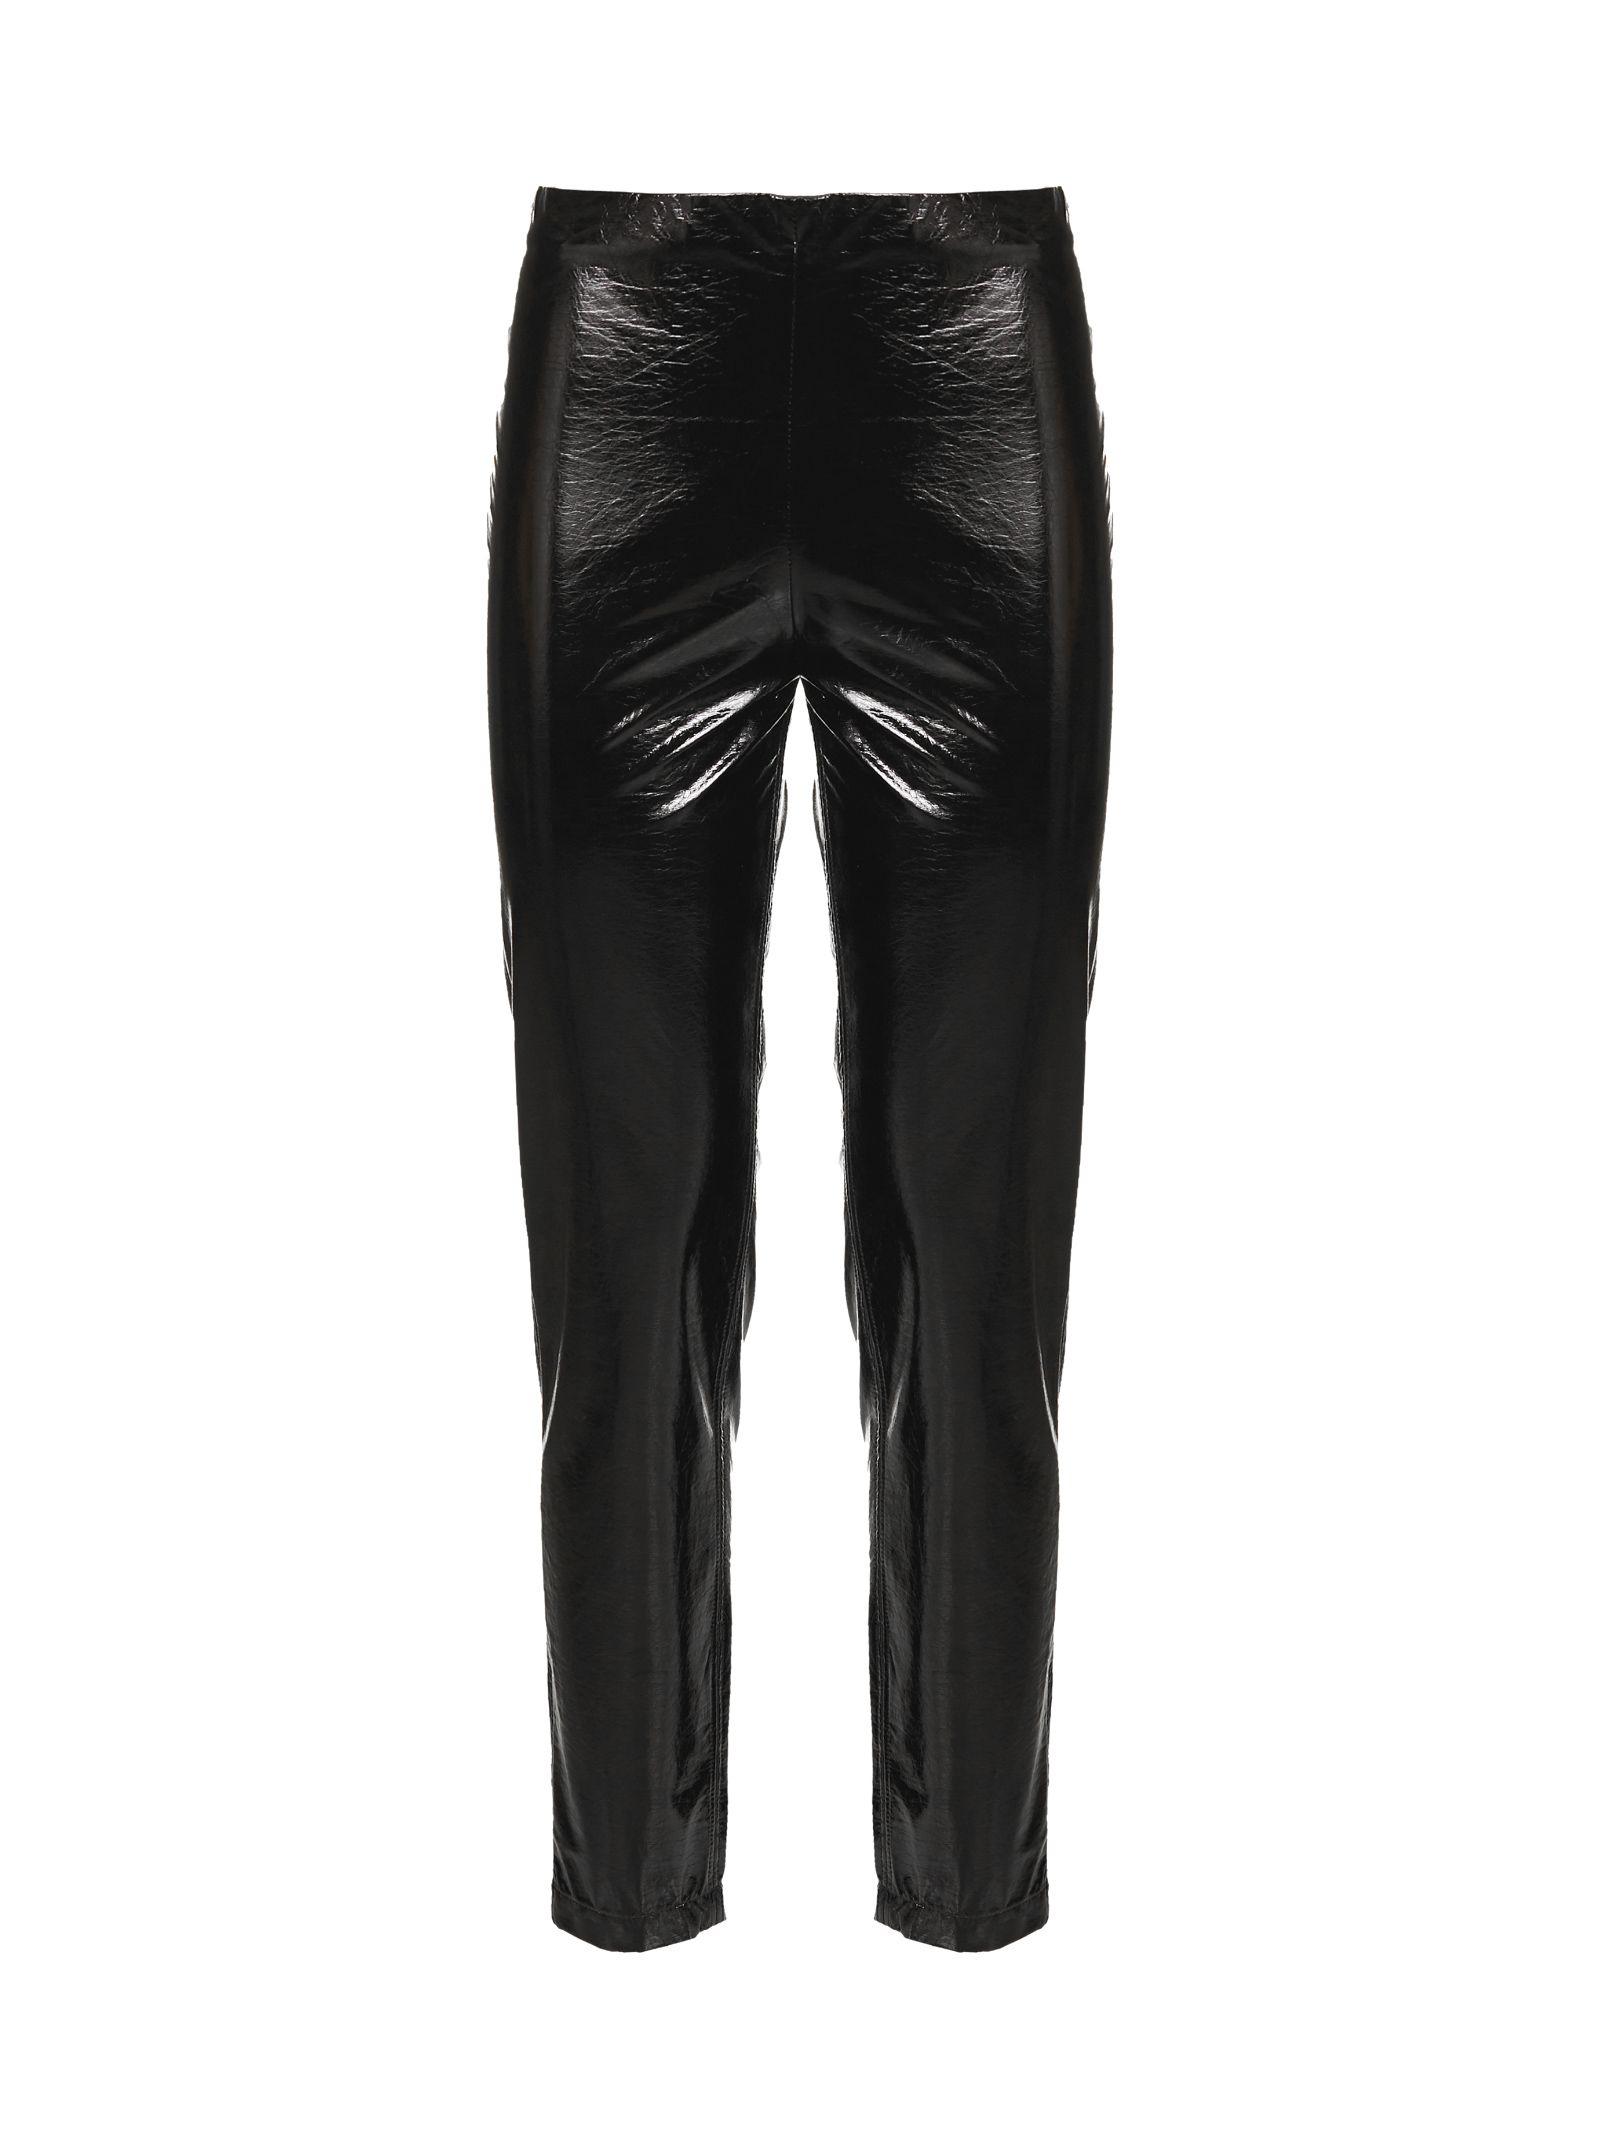 Federica Tosi Classic Trousers